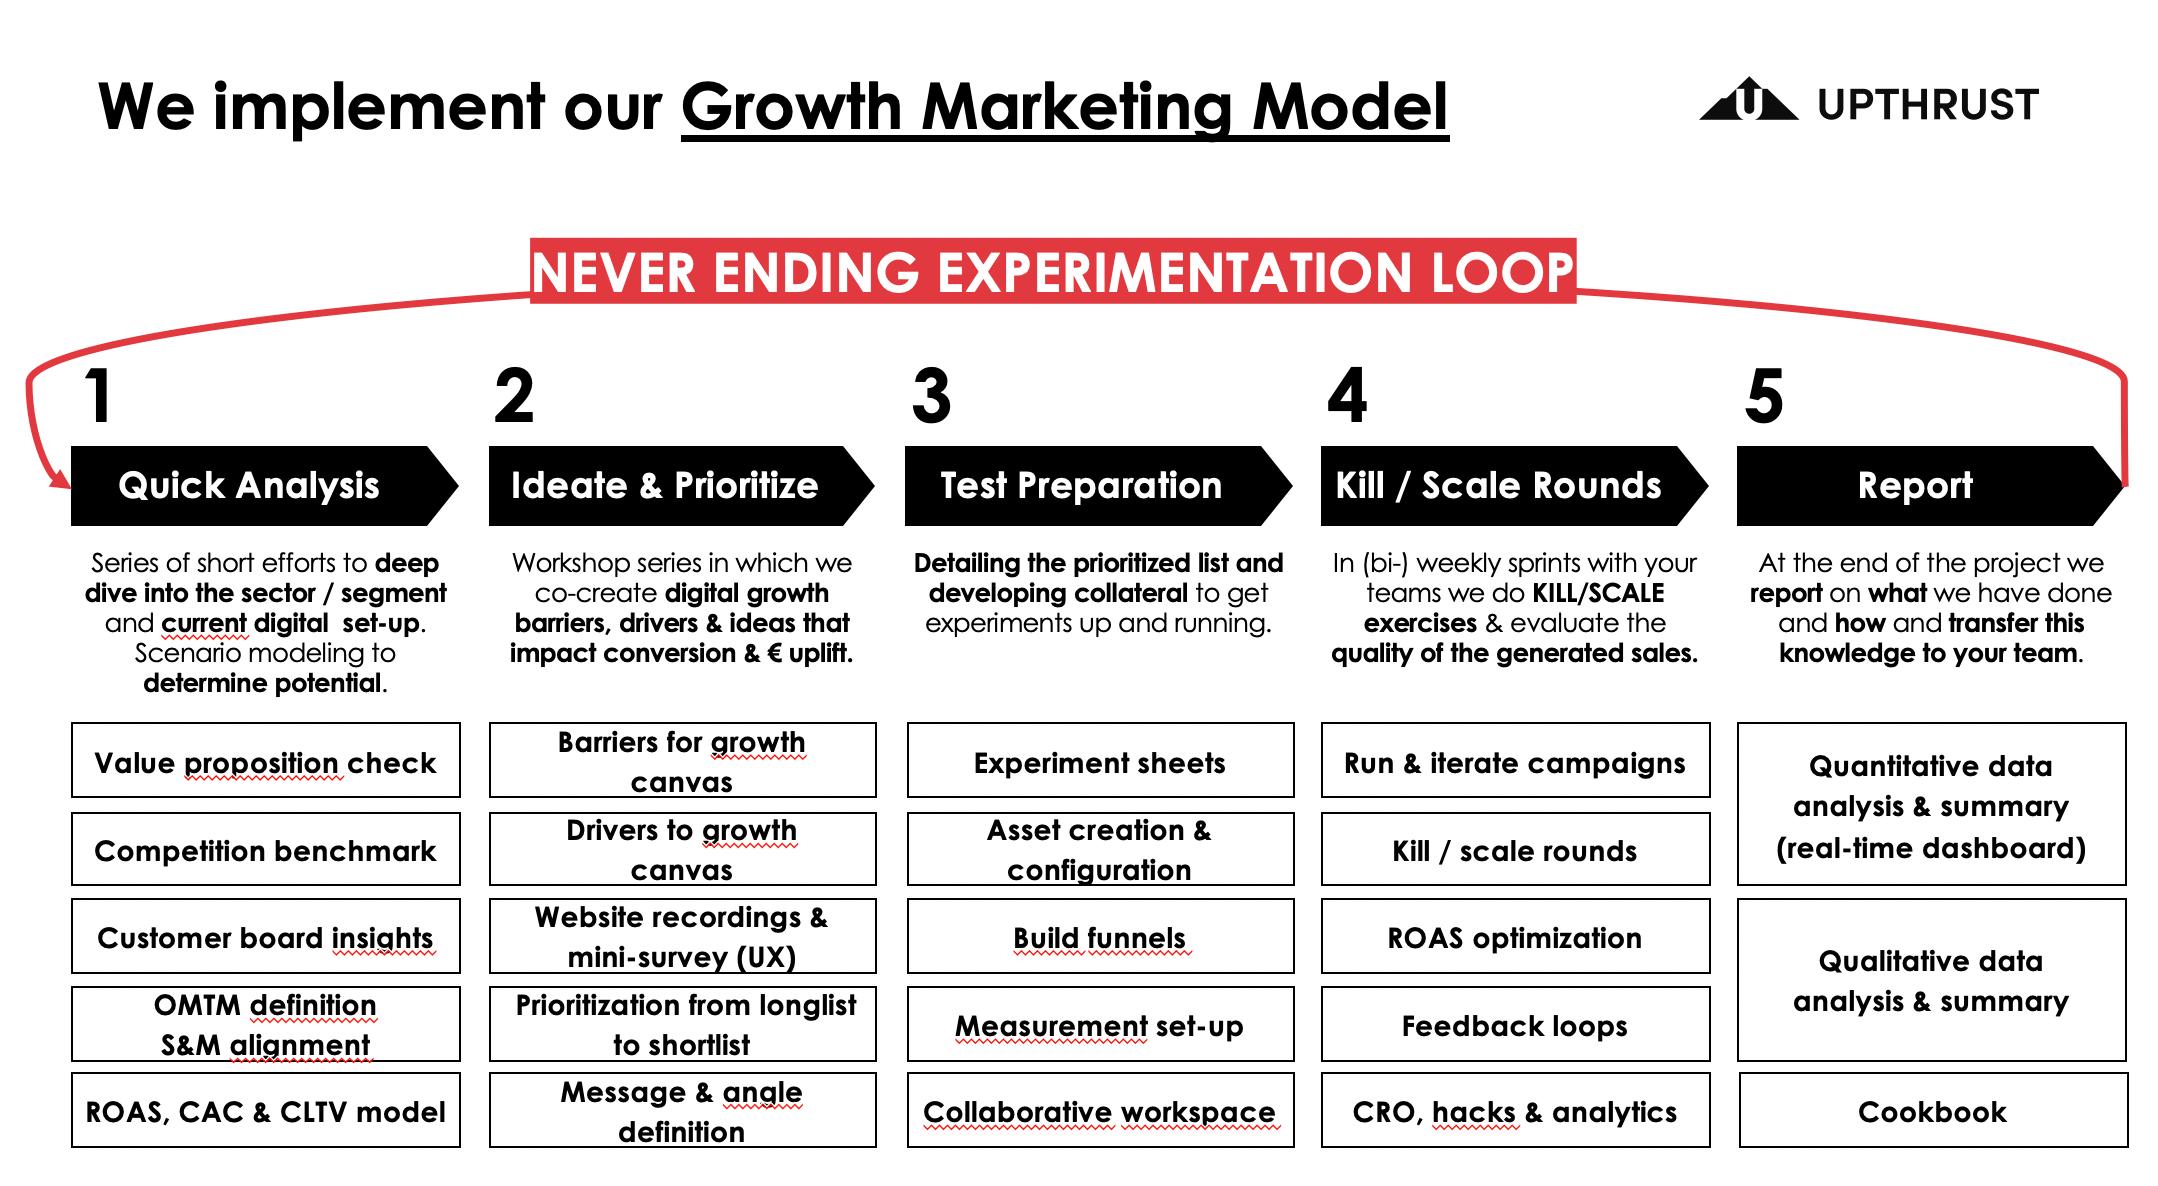 Growth Marketing Model